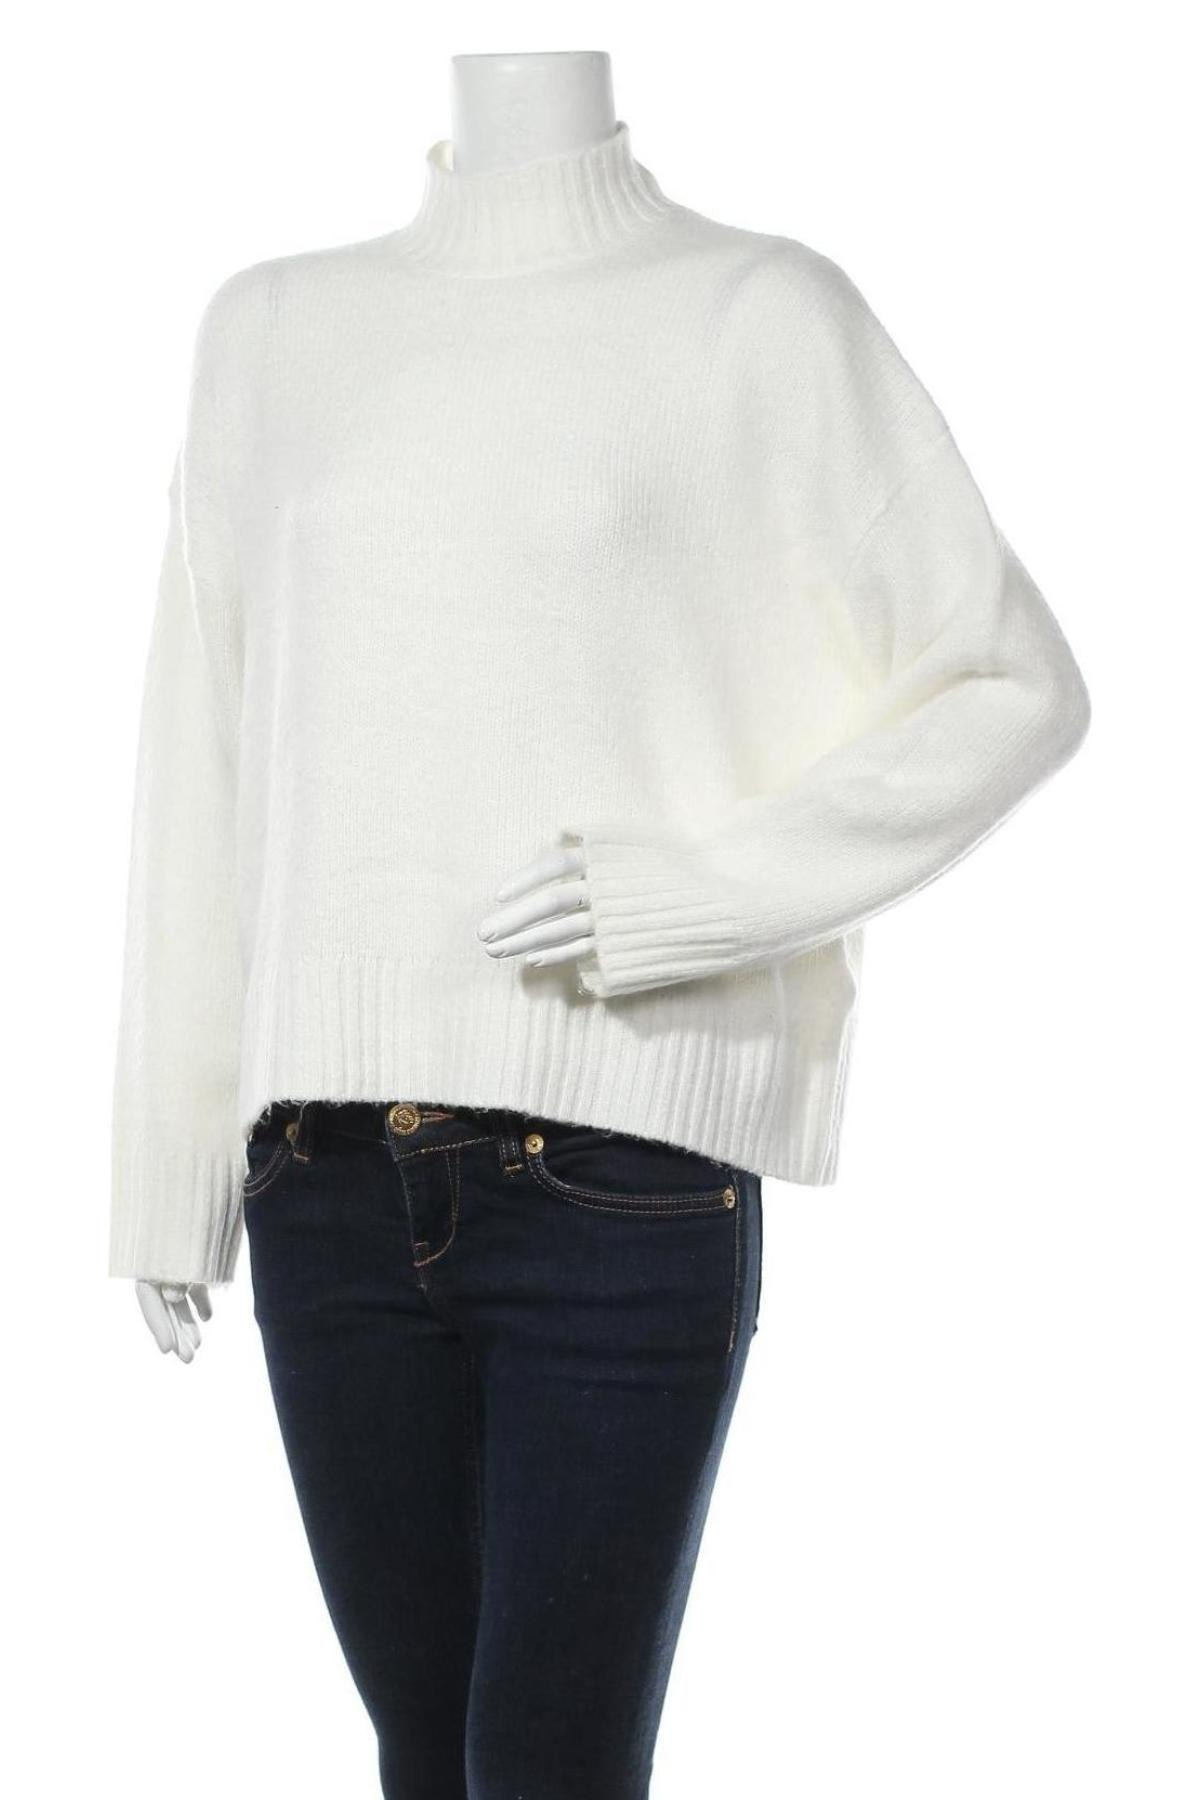 Дамски пуловер Even&Odd, Размер L, Цвят Бял, 62% полиестер, 34% полиакрил, 4% еластан, Цена 36,75лв.